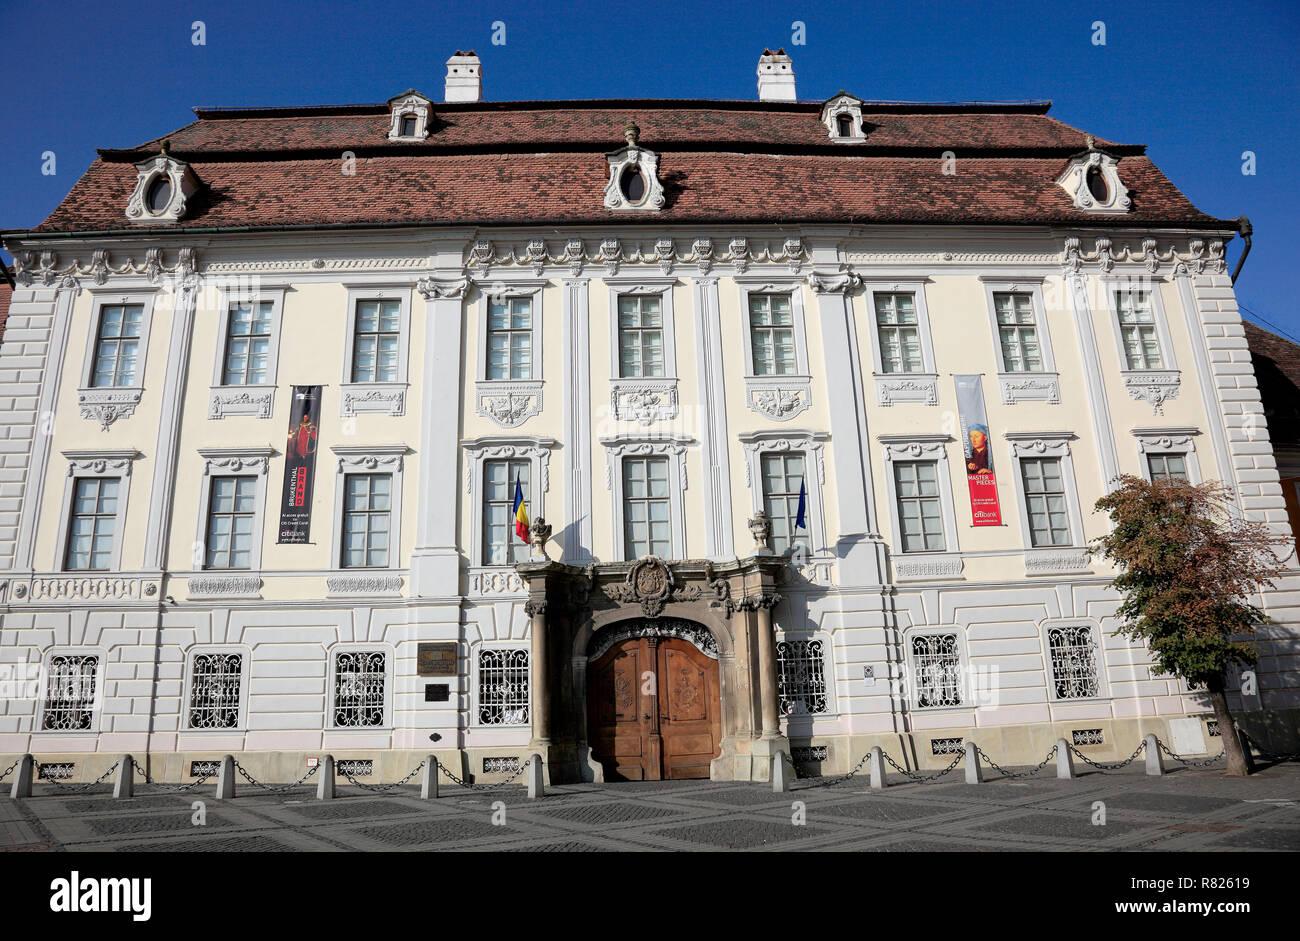 Brukenthal Palace, Sibiu oder Hermannstadt, Siebenbürgen, Romania - Stock Image